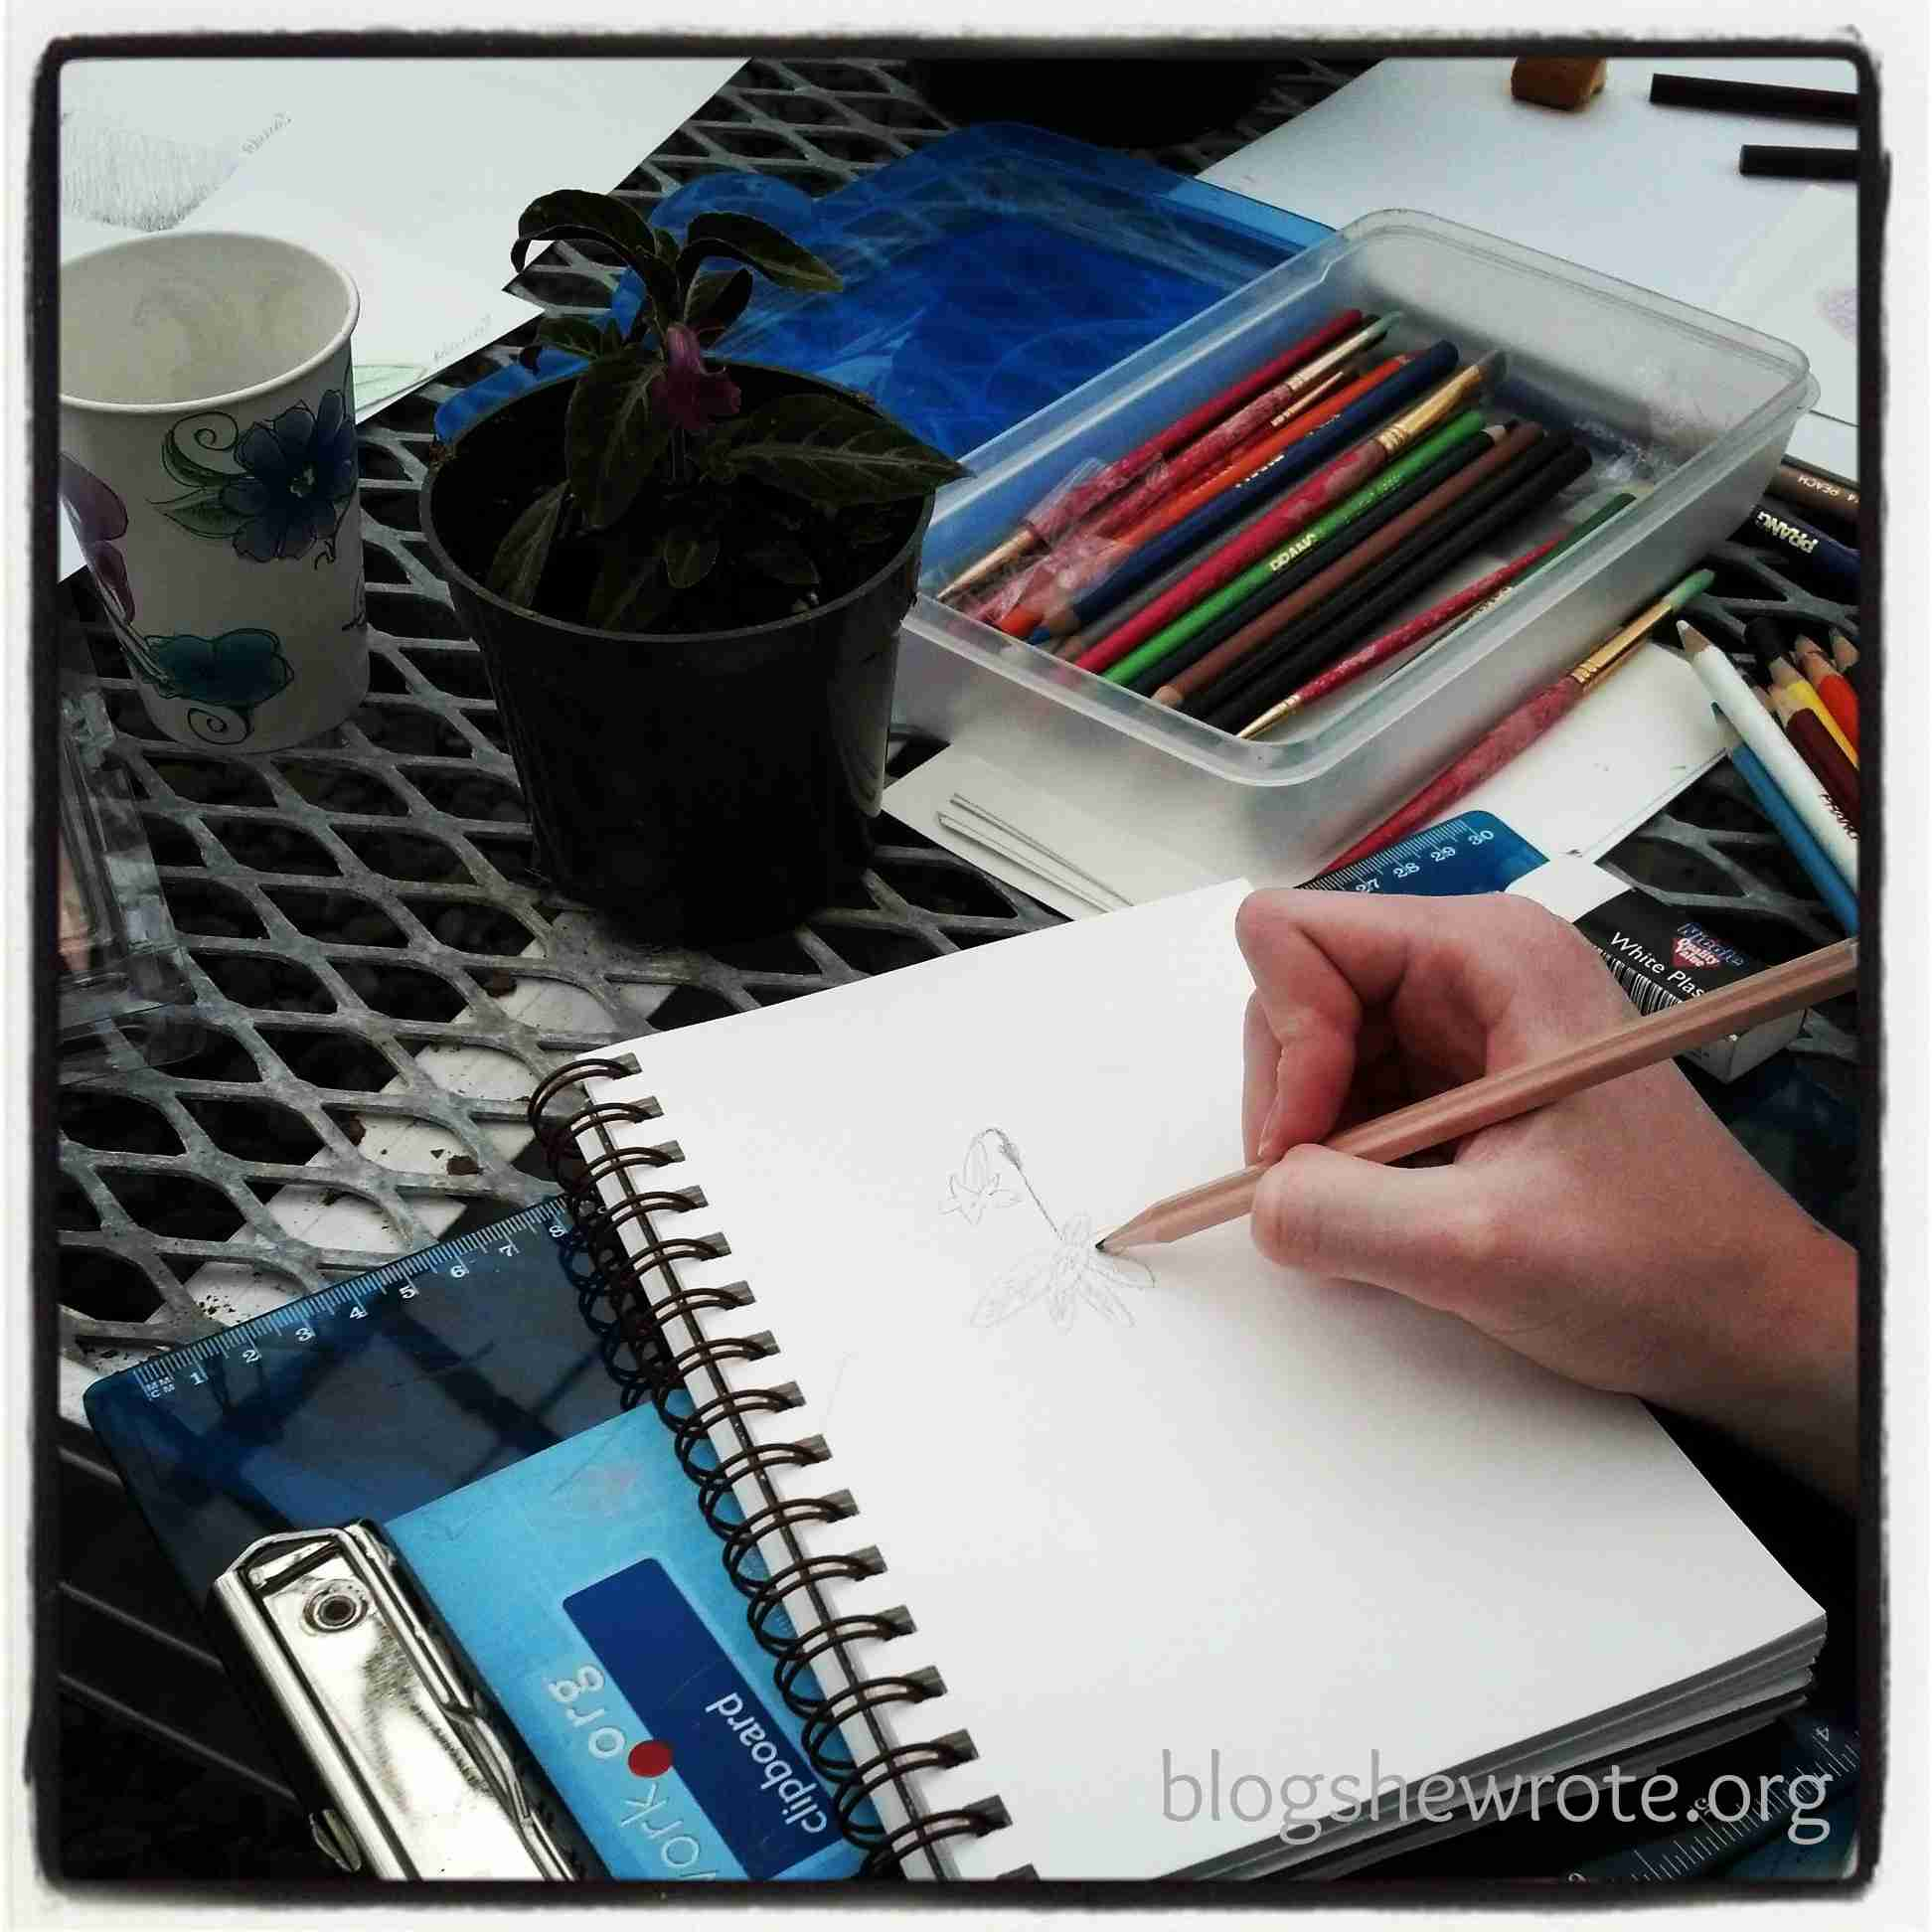 Blog, She Wrote: Tips for Botanical Illustrating